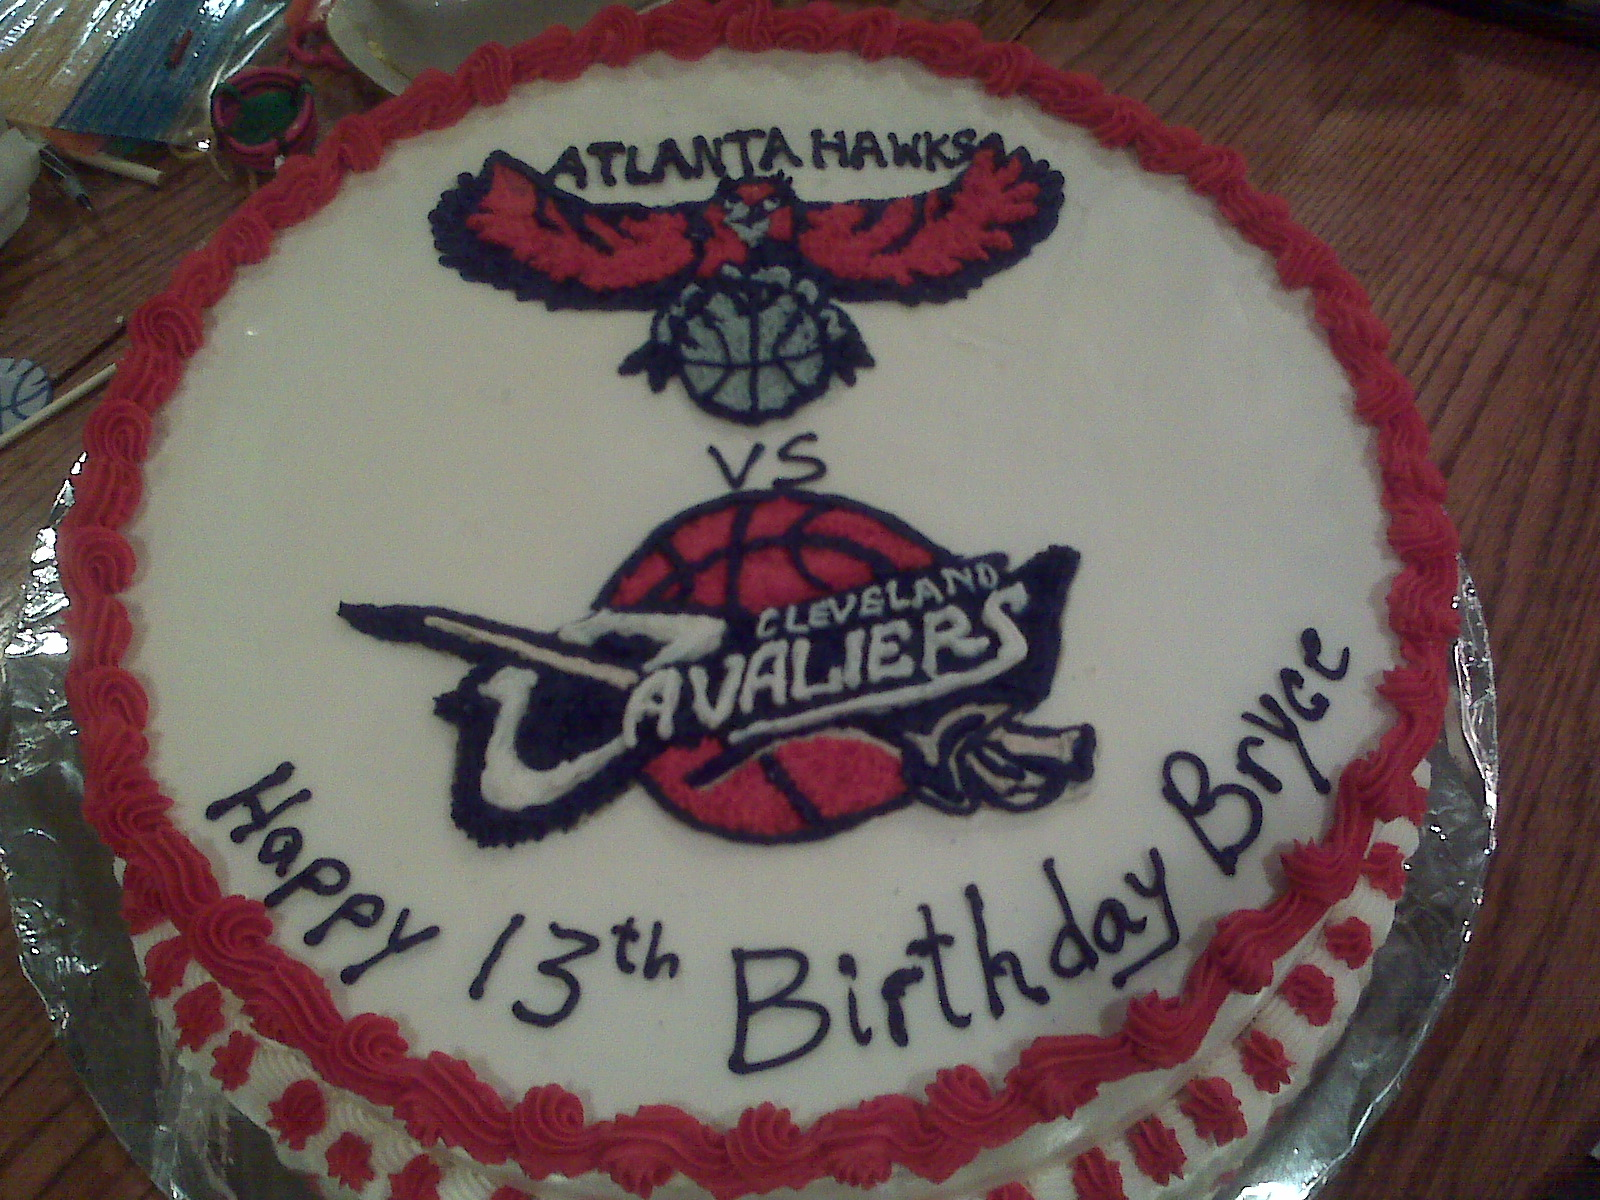 Atlanta Hawks vs Cavaliers